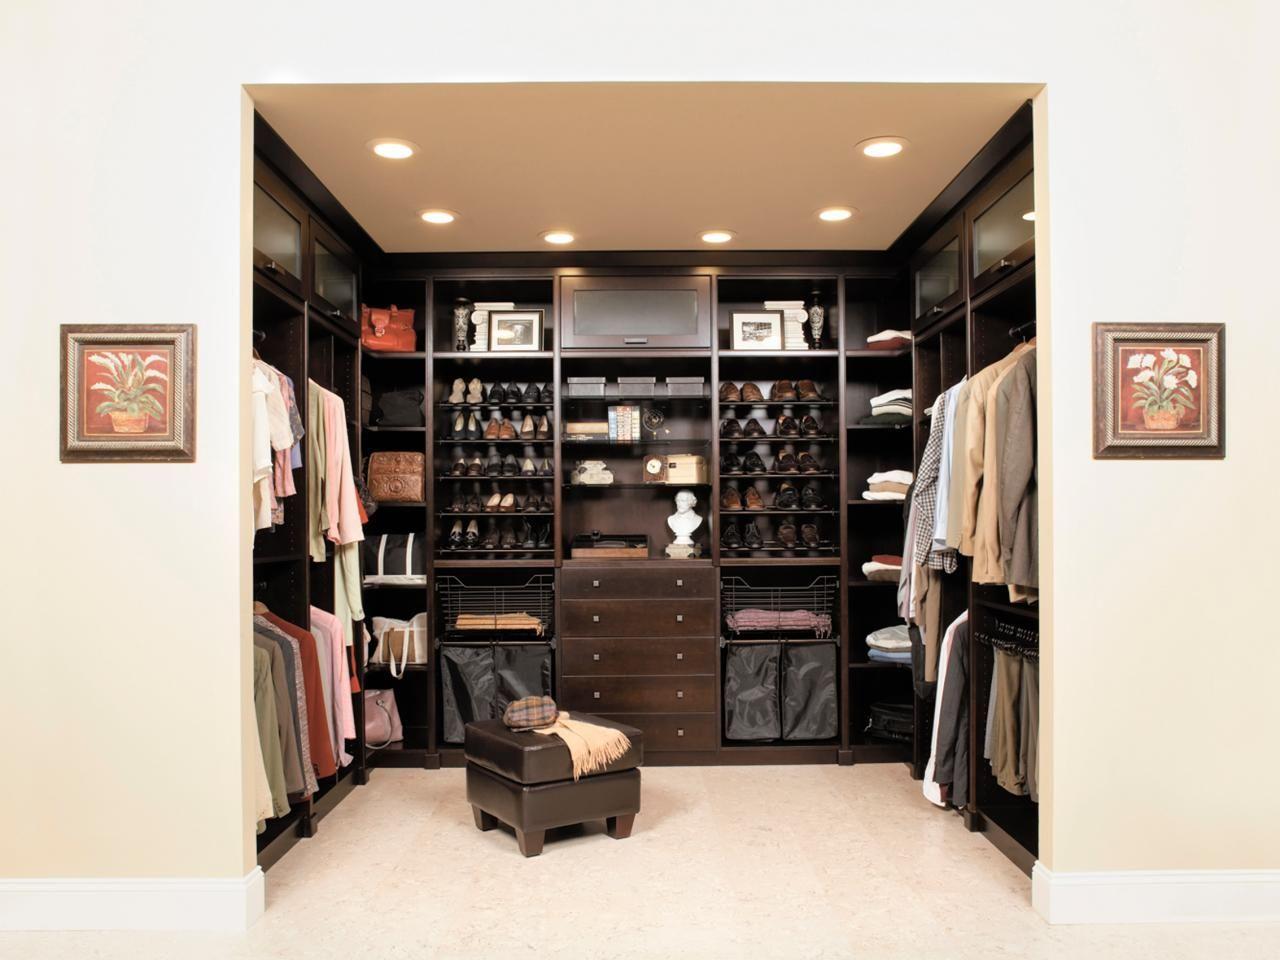 WalkIn Closet Design Ideas Master Closet Closet Designs And - Master closet designs for an organized space